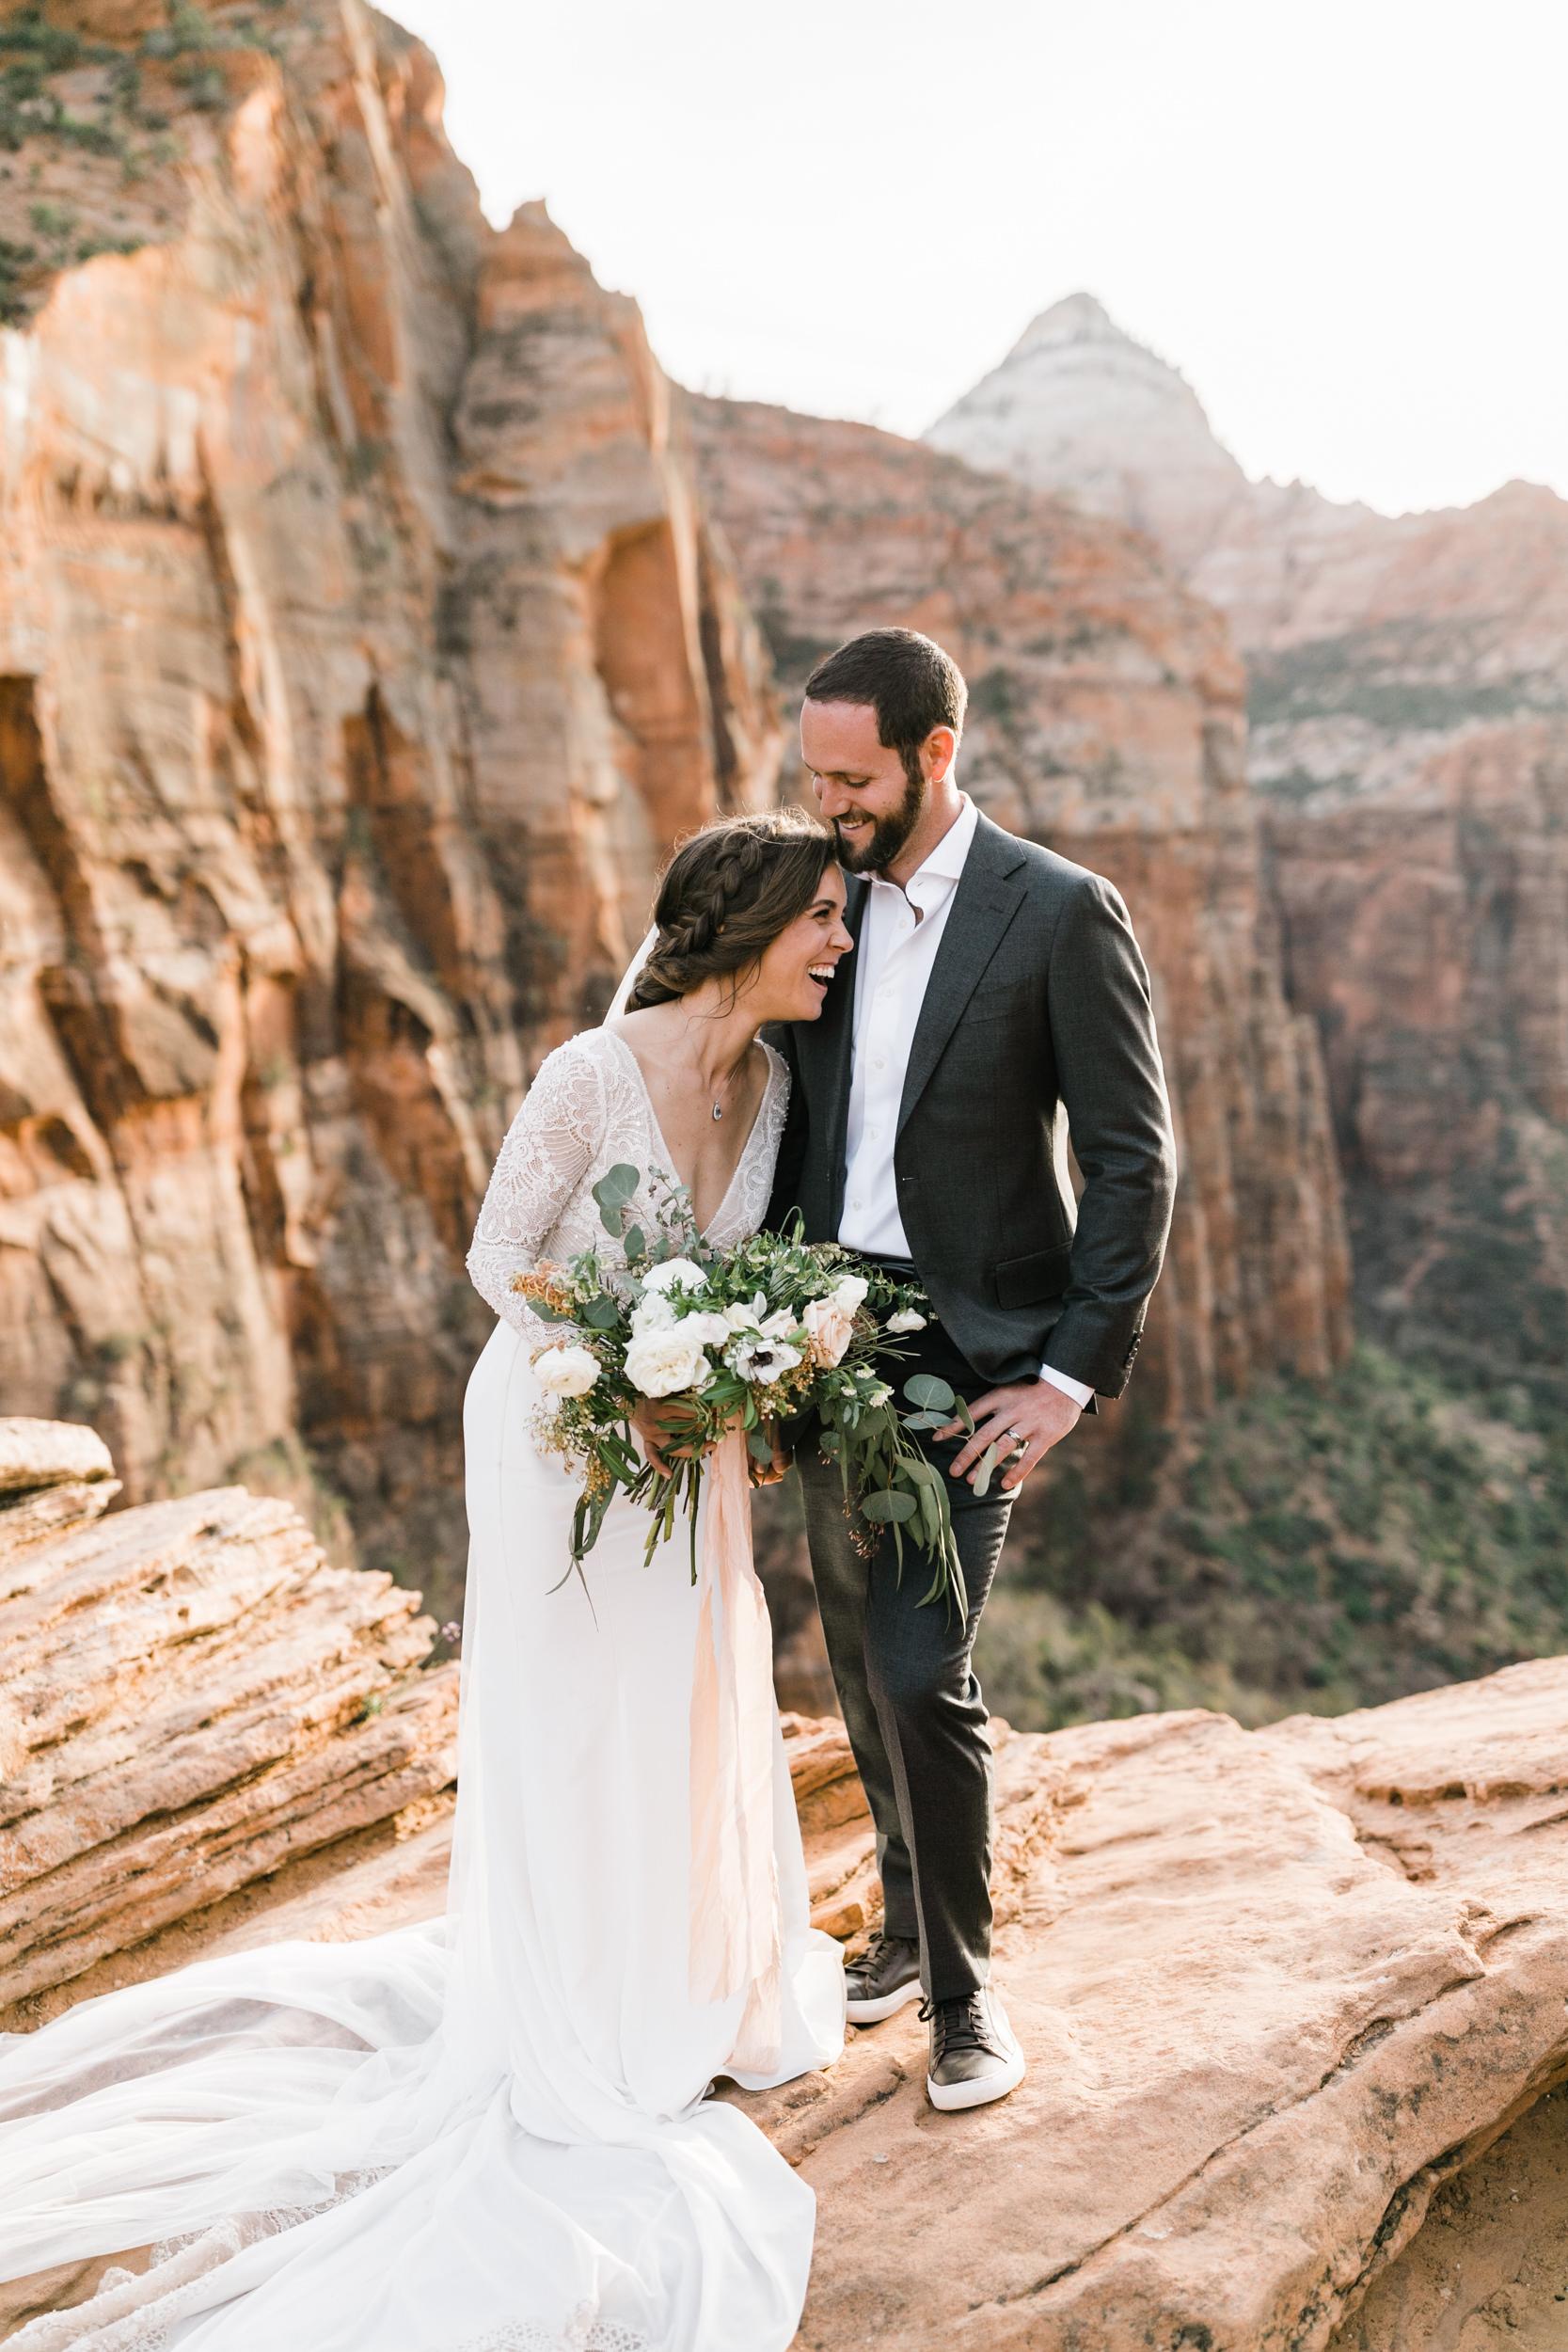 Zion-National-Park-Adventure-Wedding-Hearnes-Elopement-Photography-42.jpg